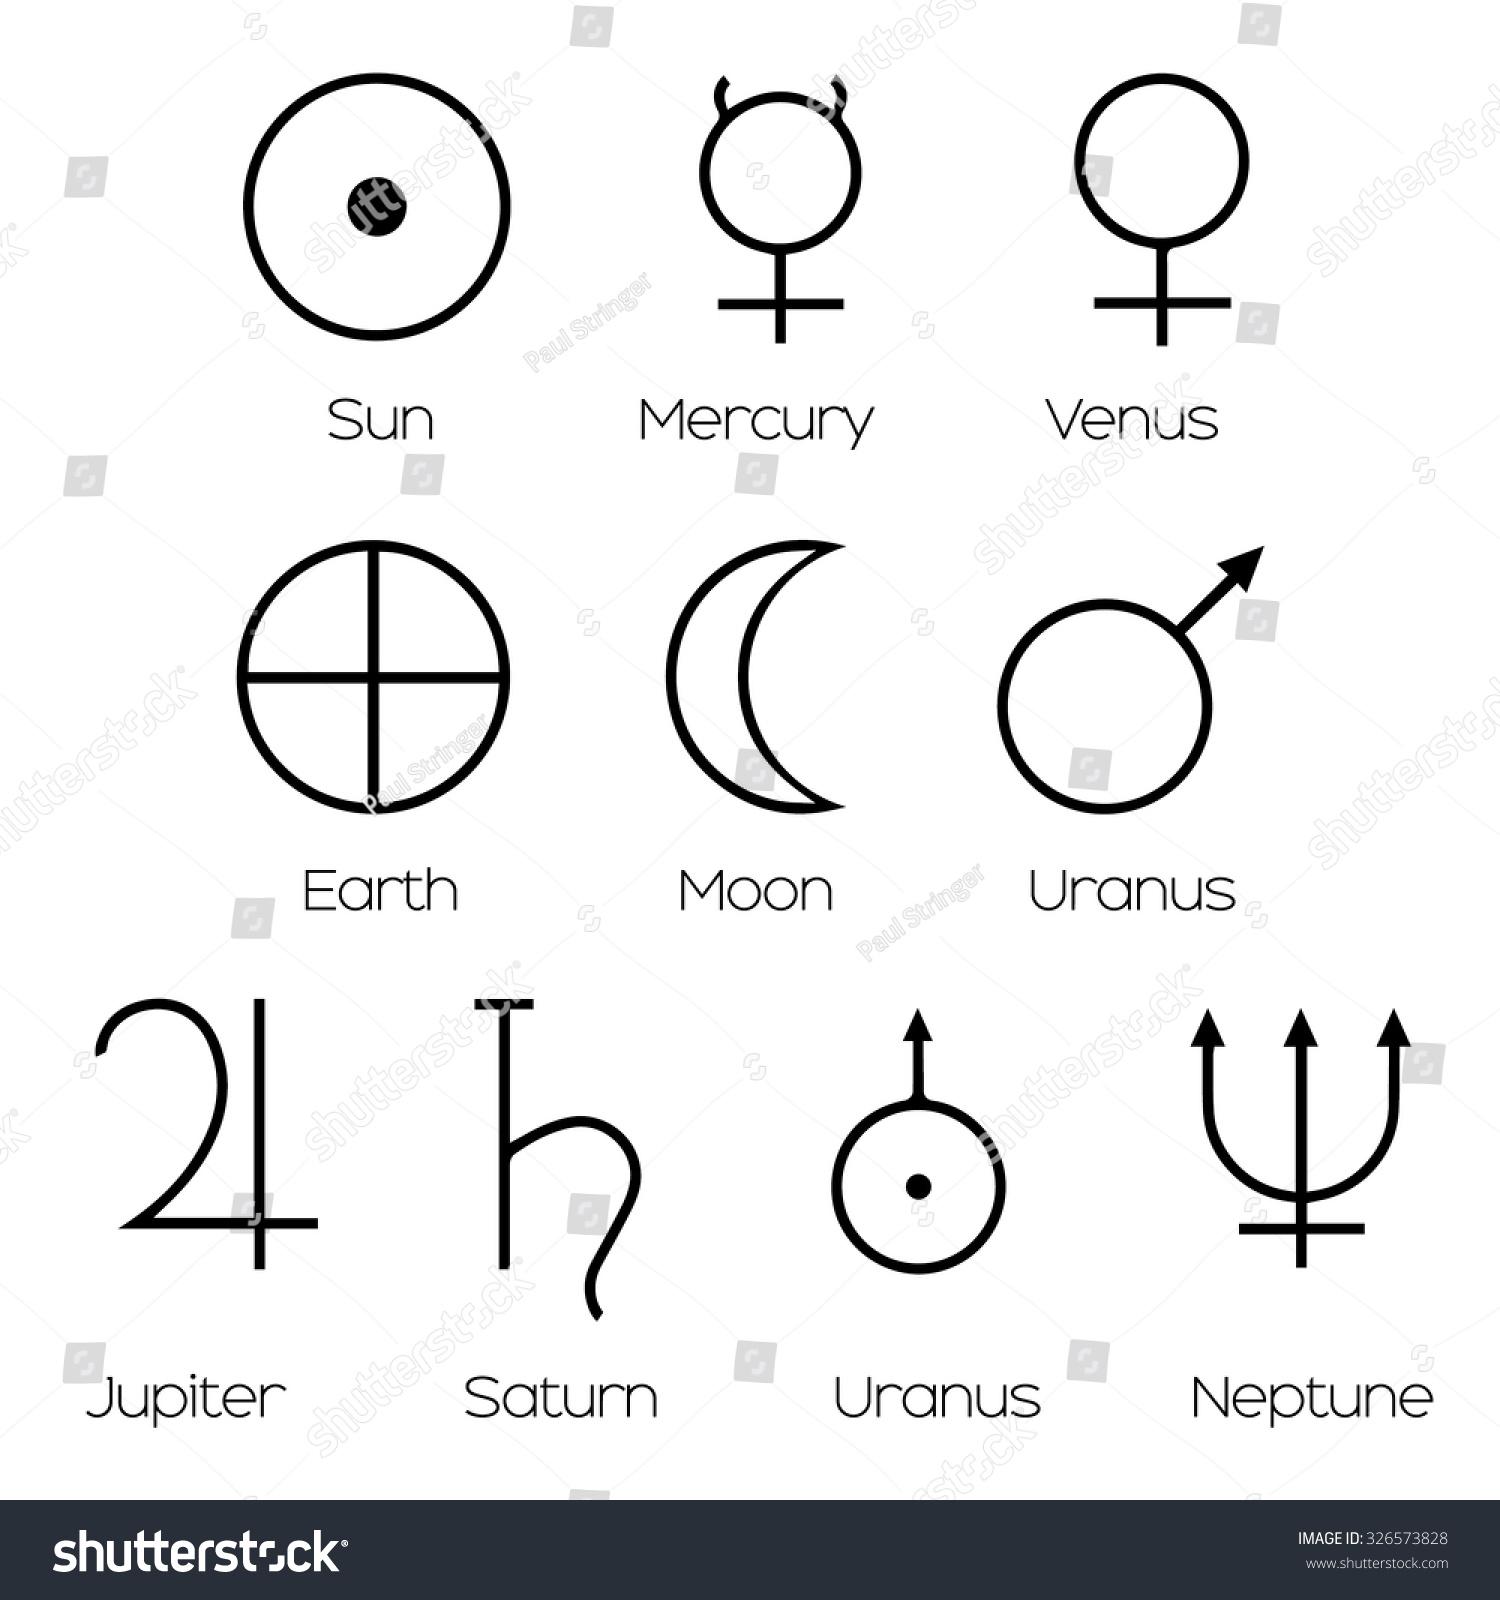 Planet Symbols Illustration Main Symbols Astrology Stock